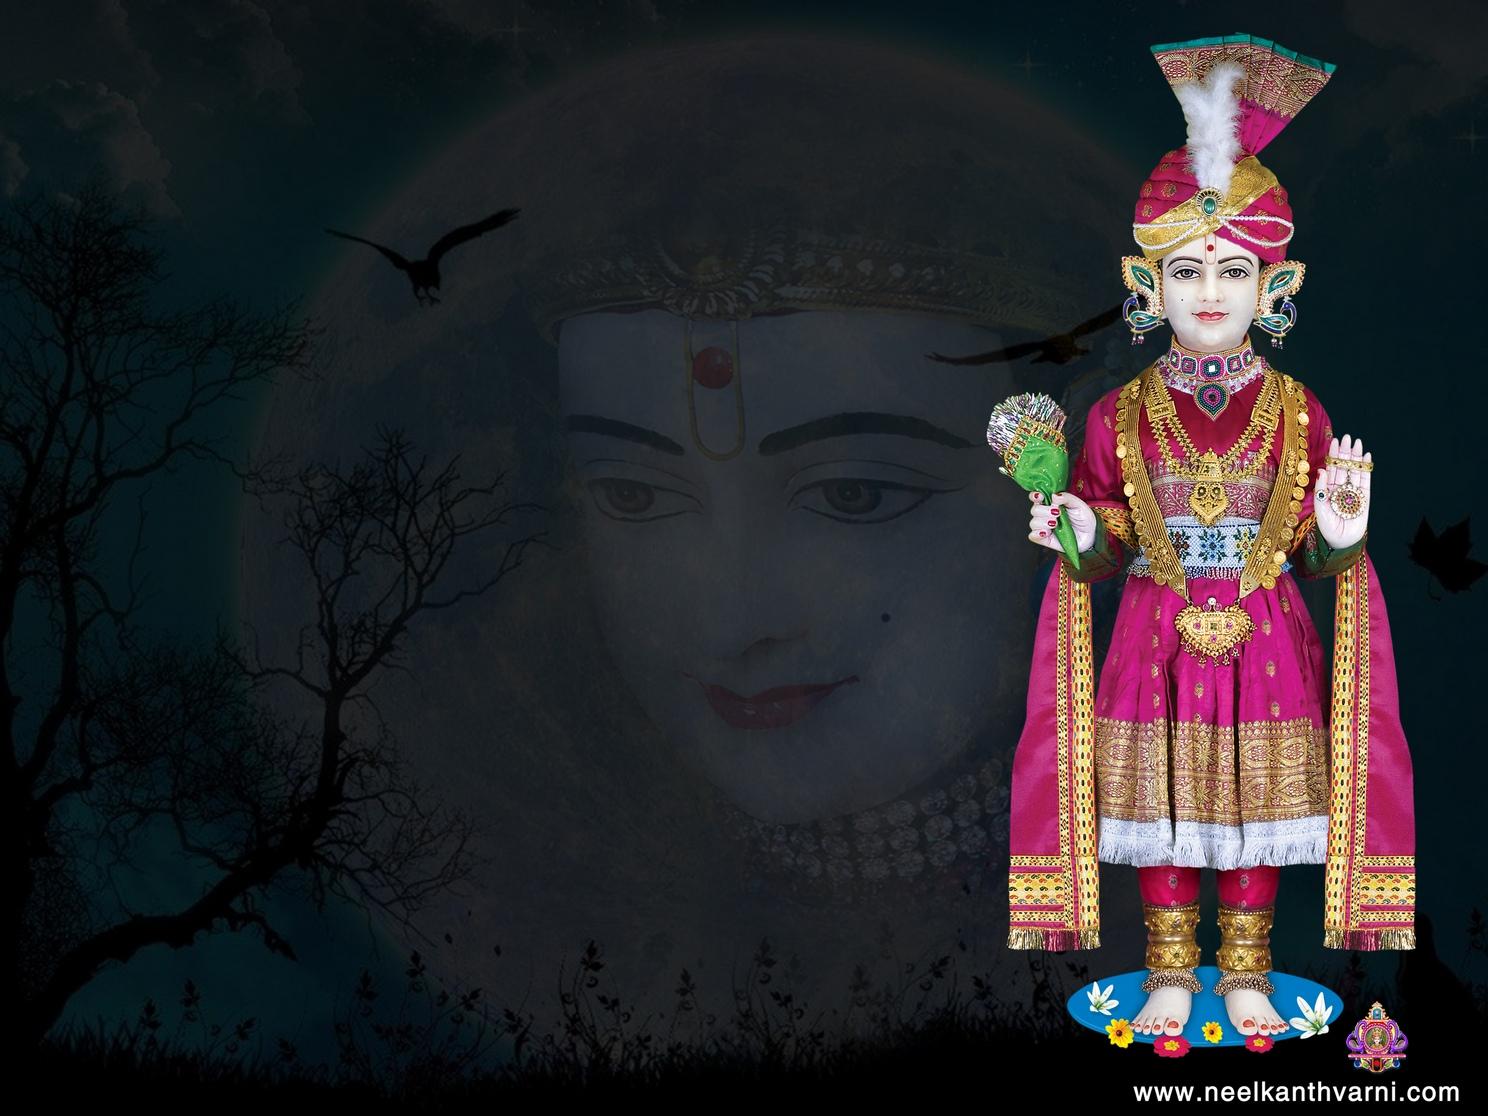 Pramukh Swami 3d Wallpaper Jay Swaminarayan Wallpapers Ghanshyam Maharaj Wallpaper